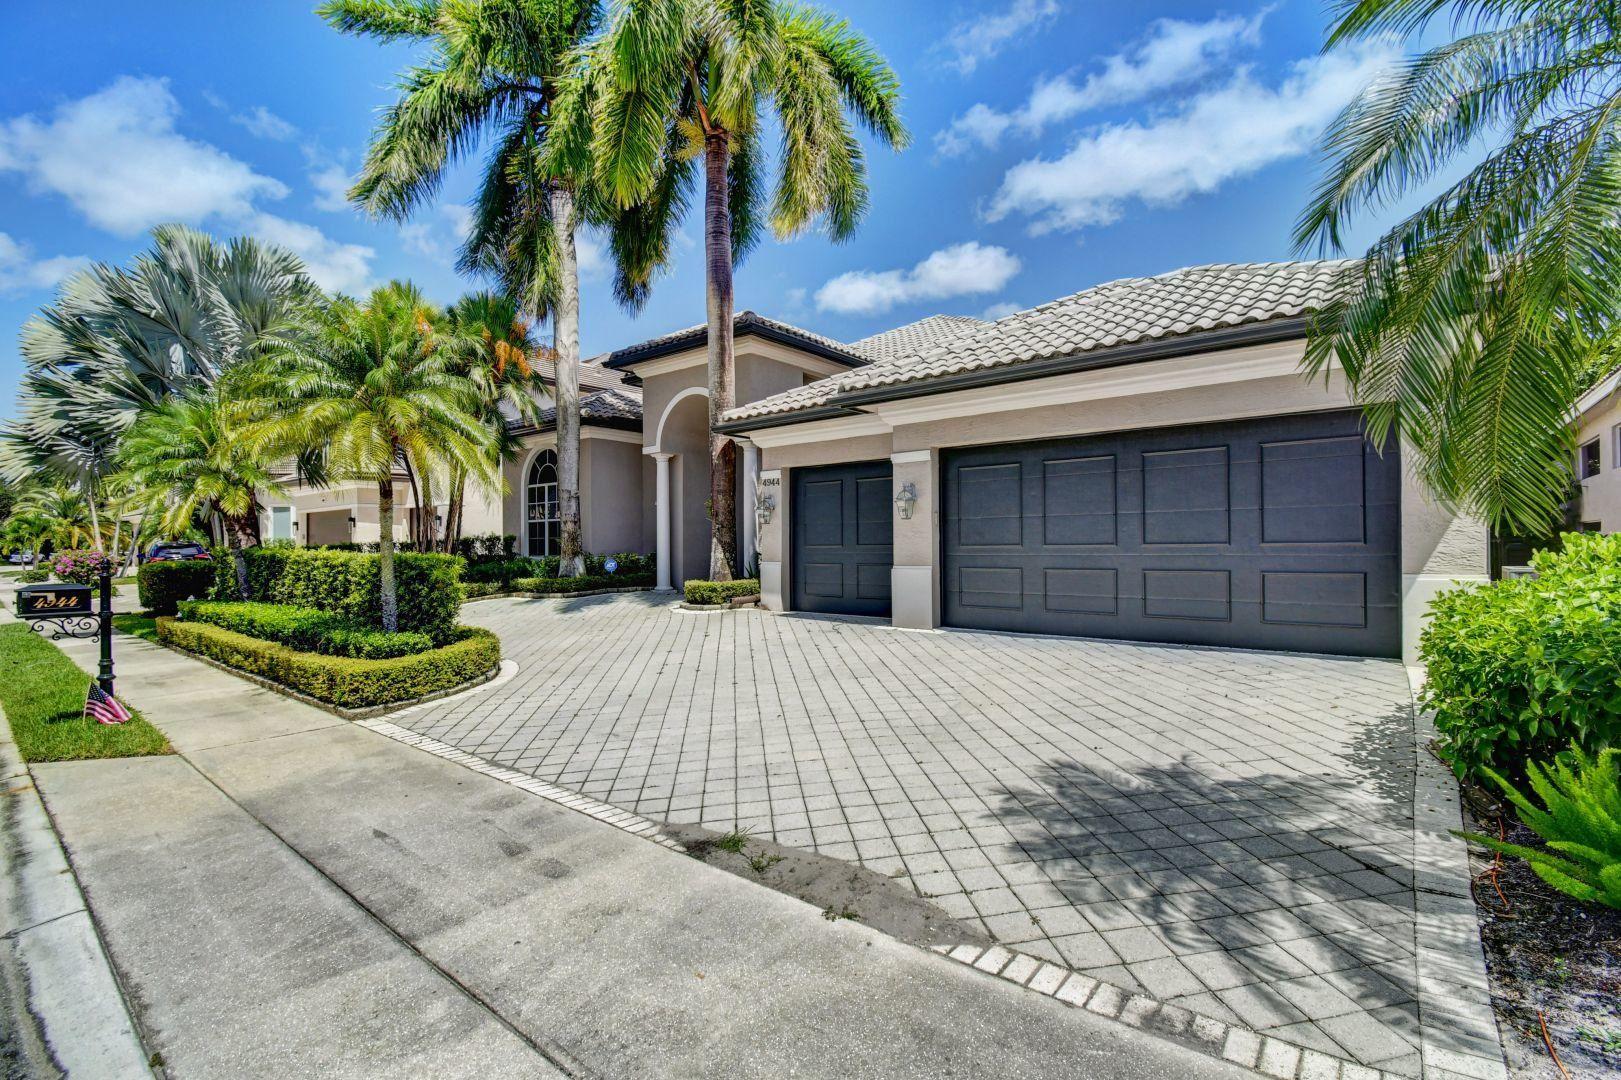 4944 NW 23rd Court, Boca Raton, FL 33431 - #: RX-10563622